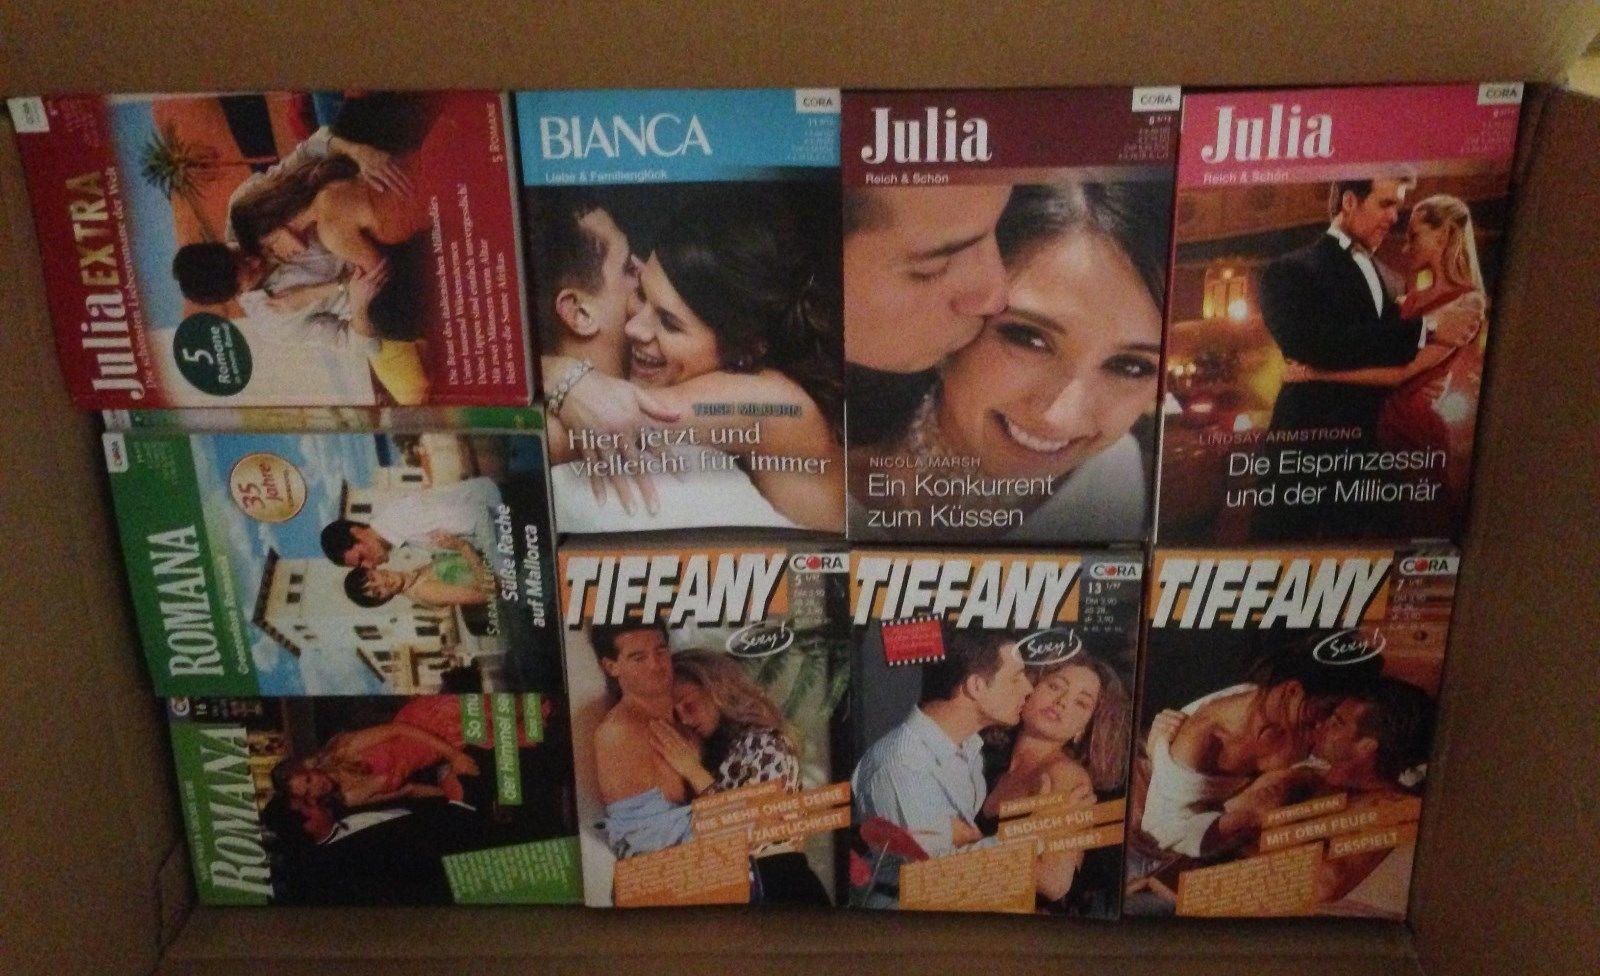 Ca. 90 Taschen-Romane der Serien Julia , Baccara , Bianca , Romana und Tiffany